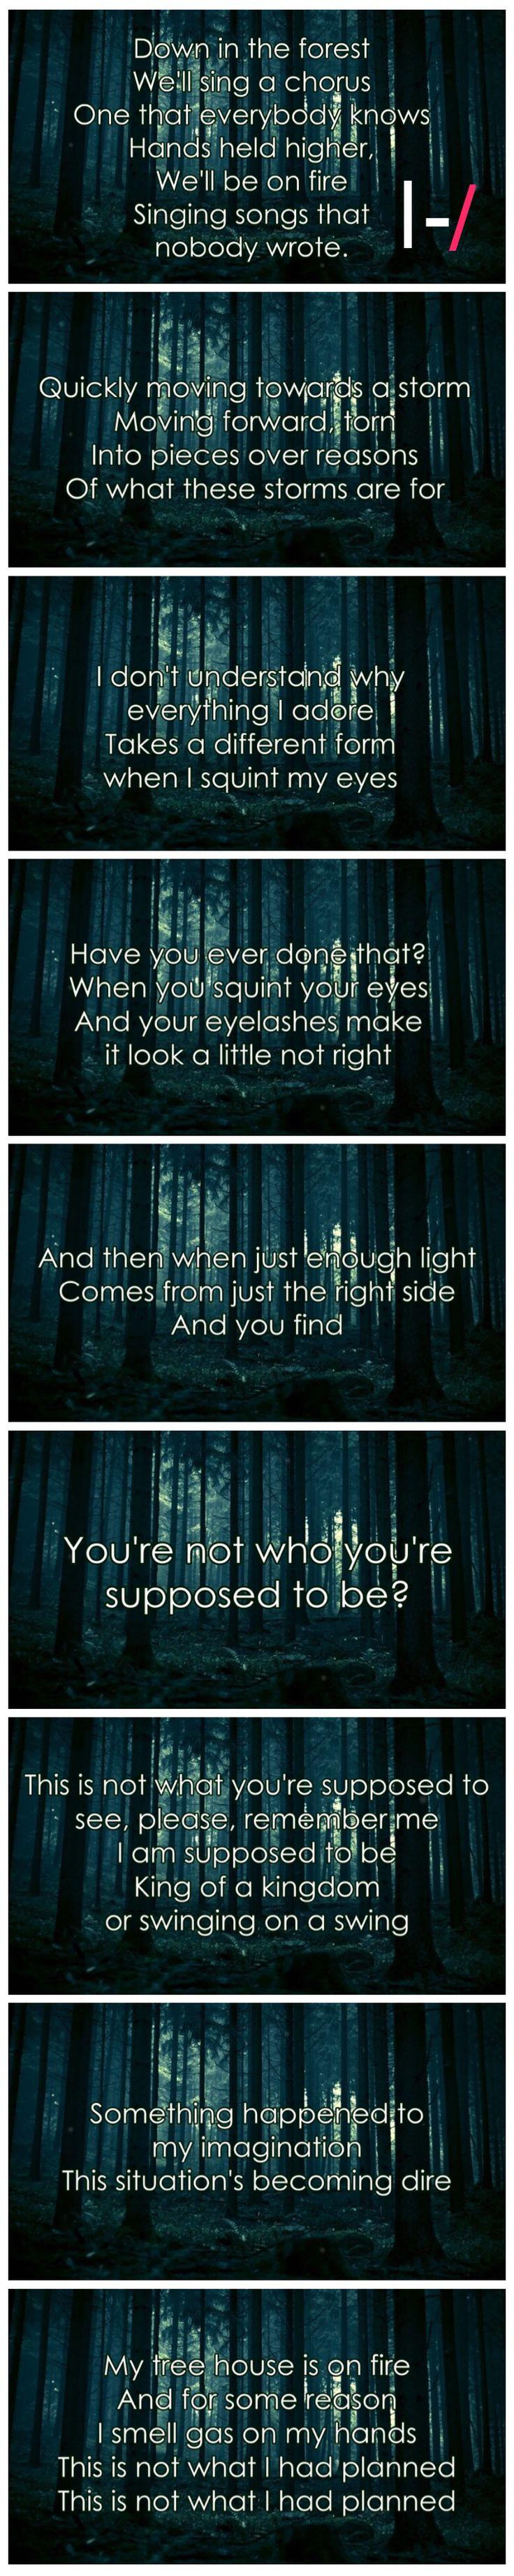 Forest |-/ Twenty One Pilots Lyrics